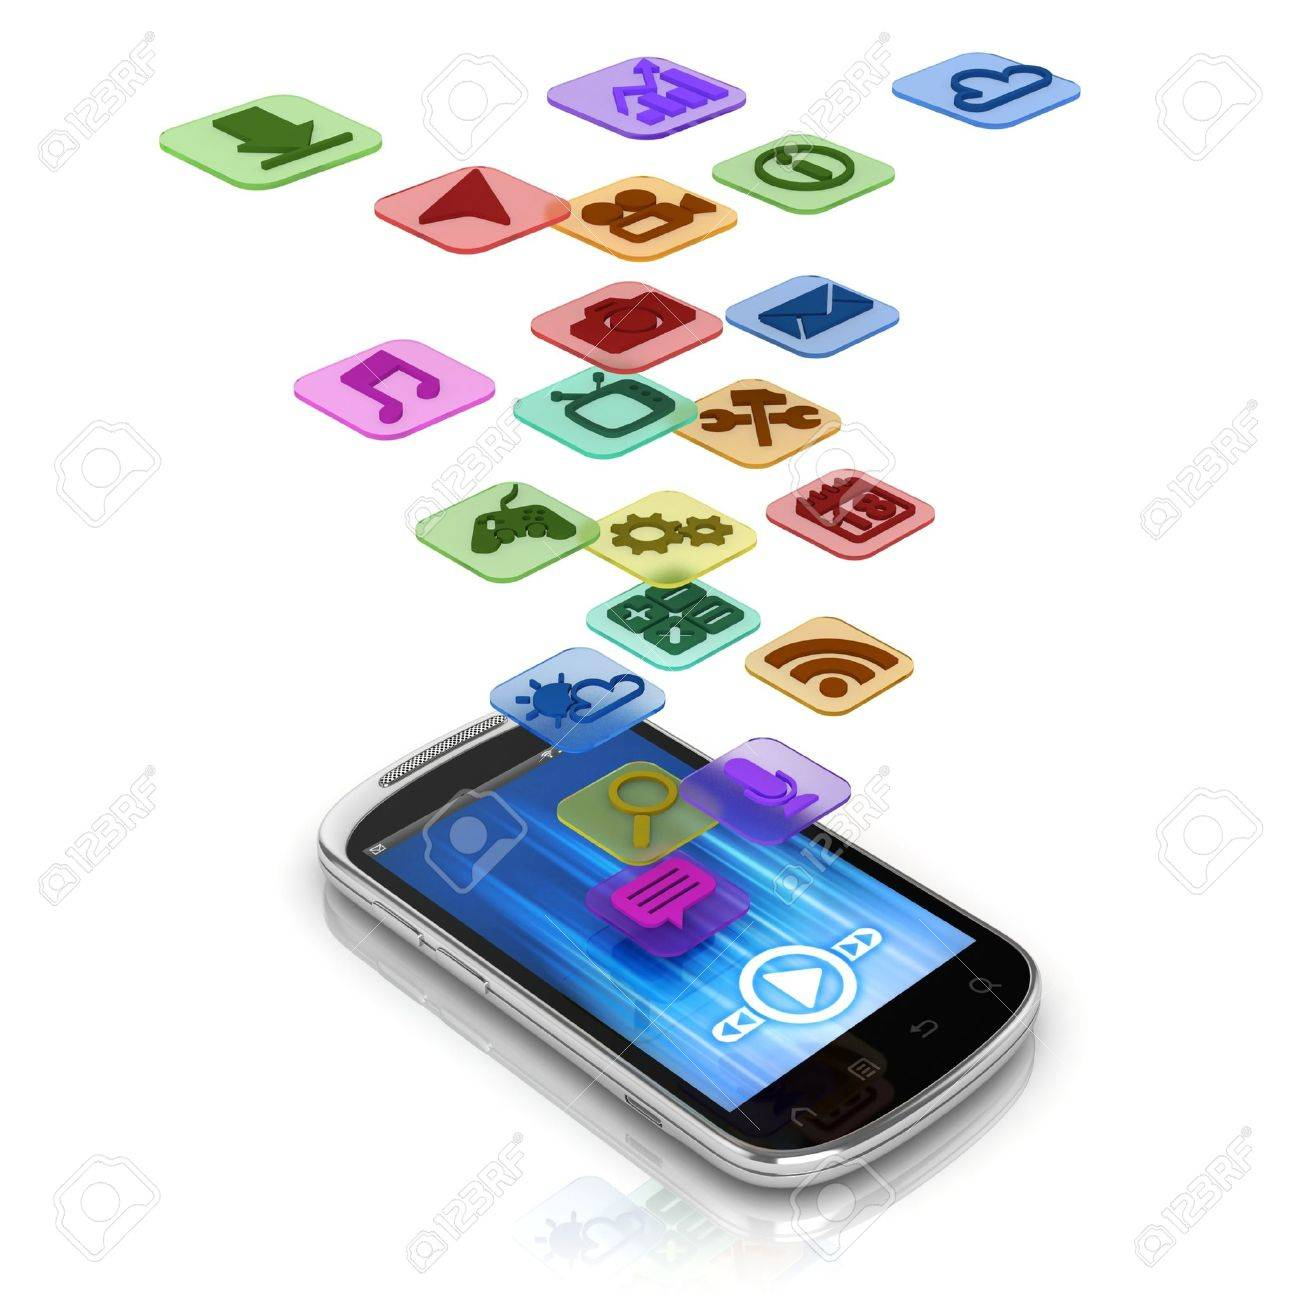 app 3d concept - smart phone application icons Stock Photo - 12330803